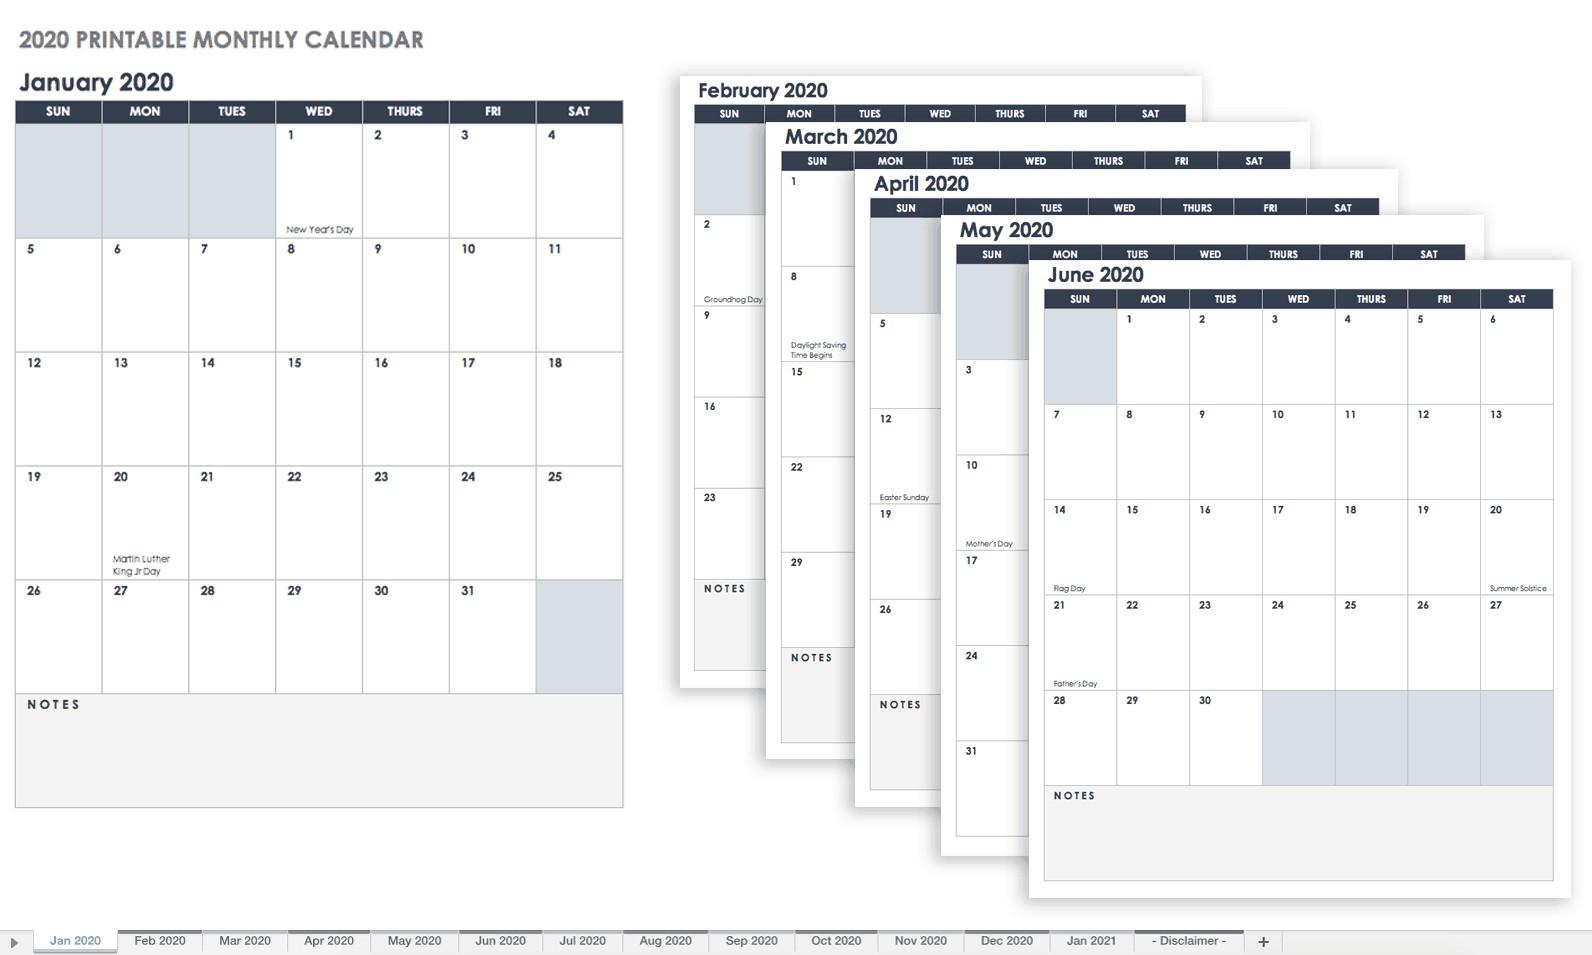 Free Printable Calendar 2020 Monthly Free Printable Excel Calendar Templates for 2019 &